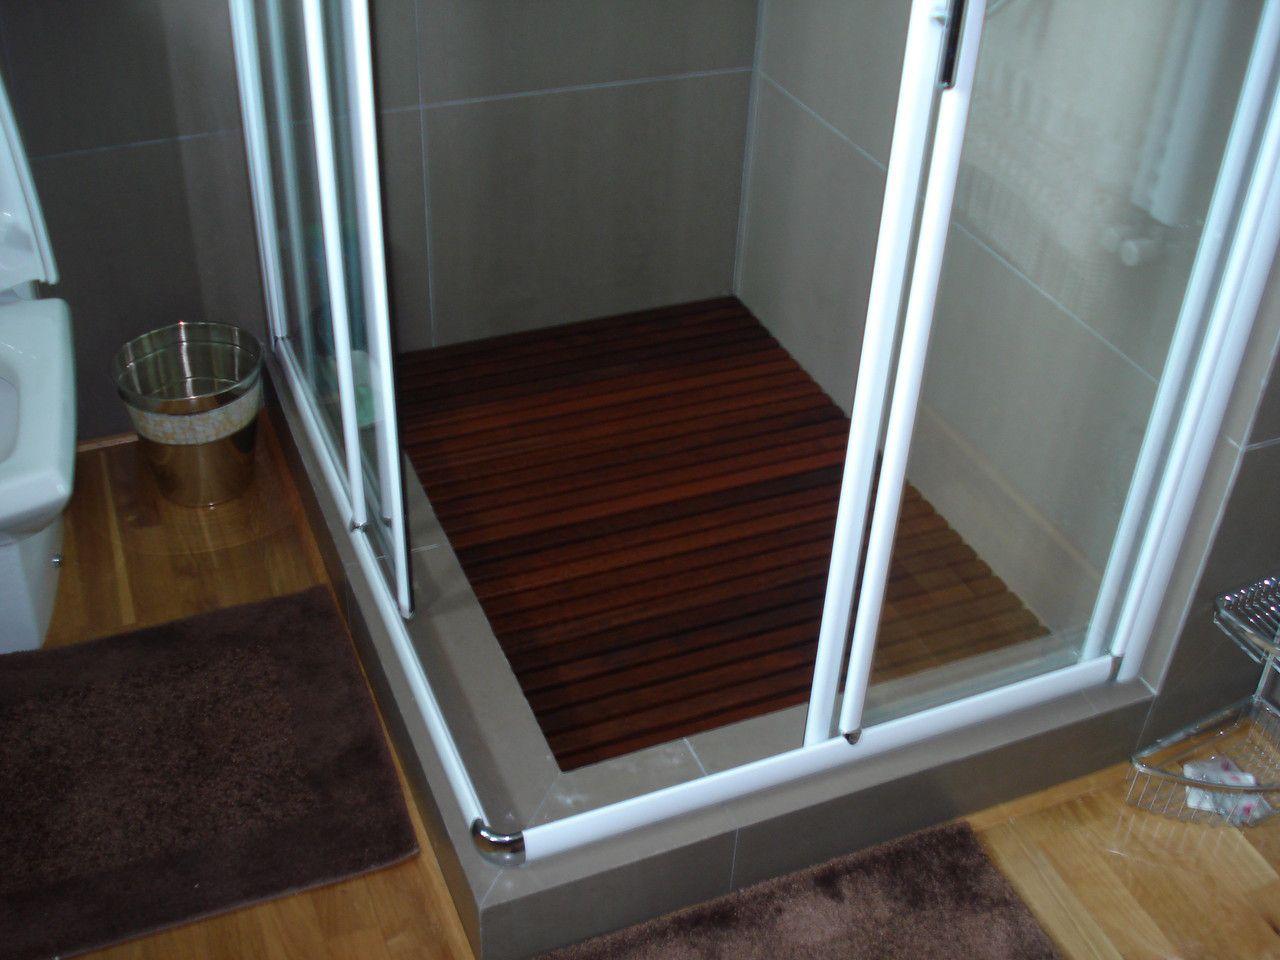 Deck De Madeira Chuveiro Box Banheiro Capacho 146x97 cm Sem Pintura somente lixado